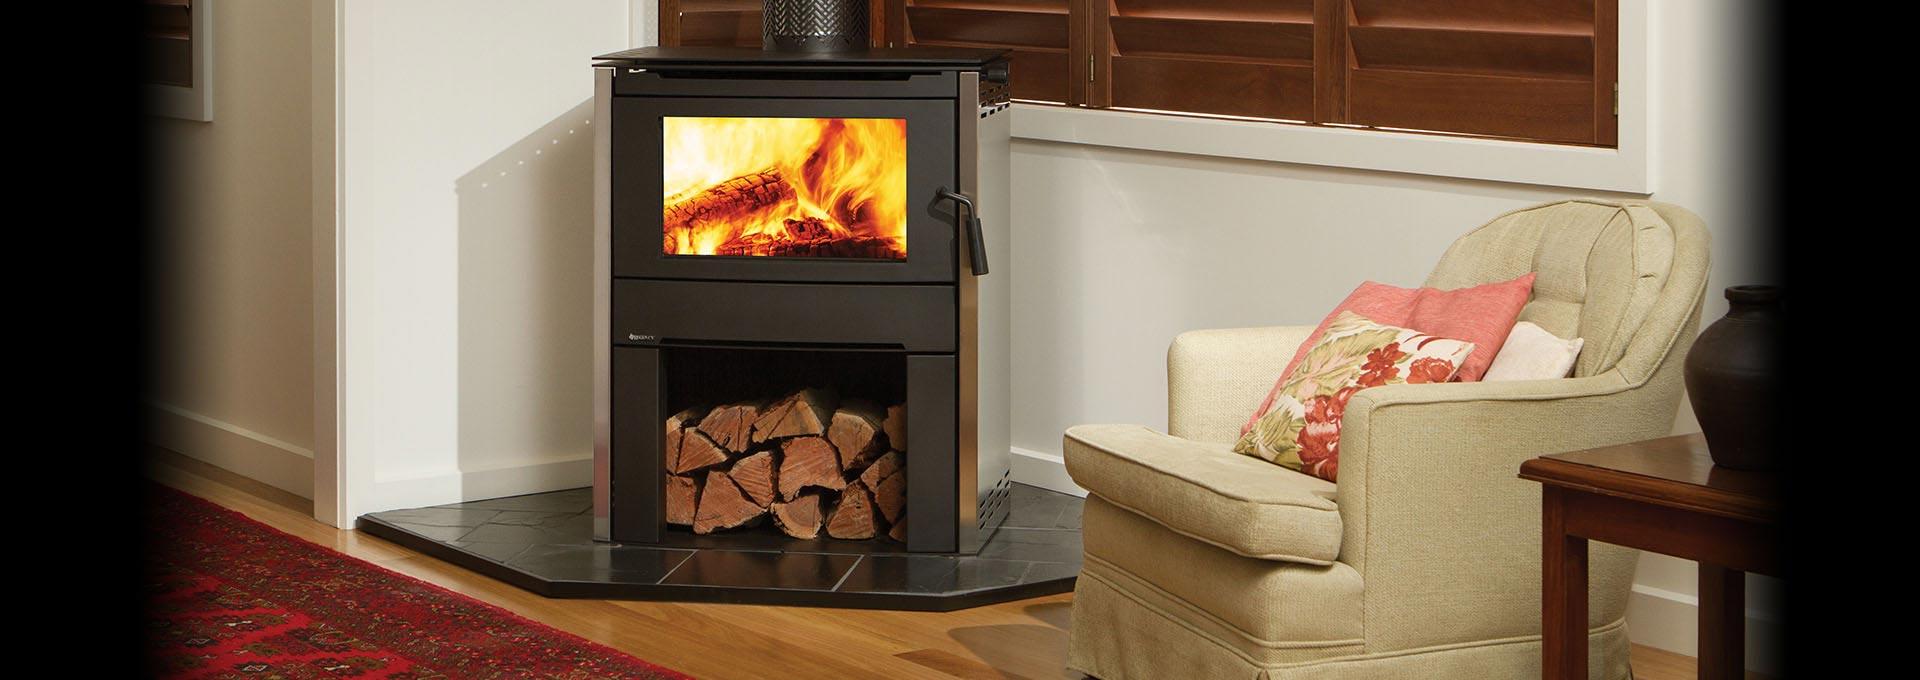 Wood Freestanding Heaters - Regency Fireplace Products Australia